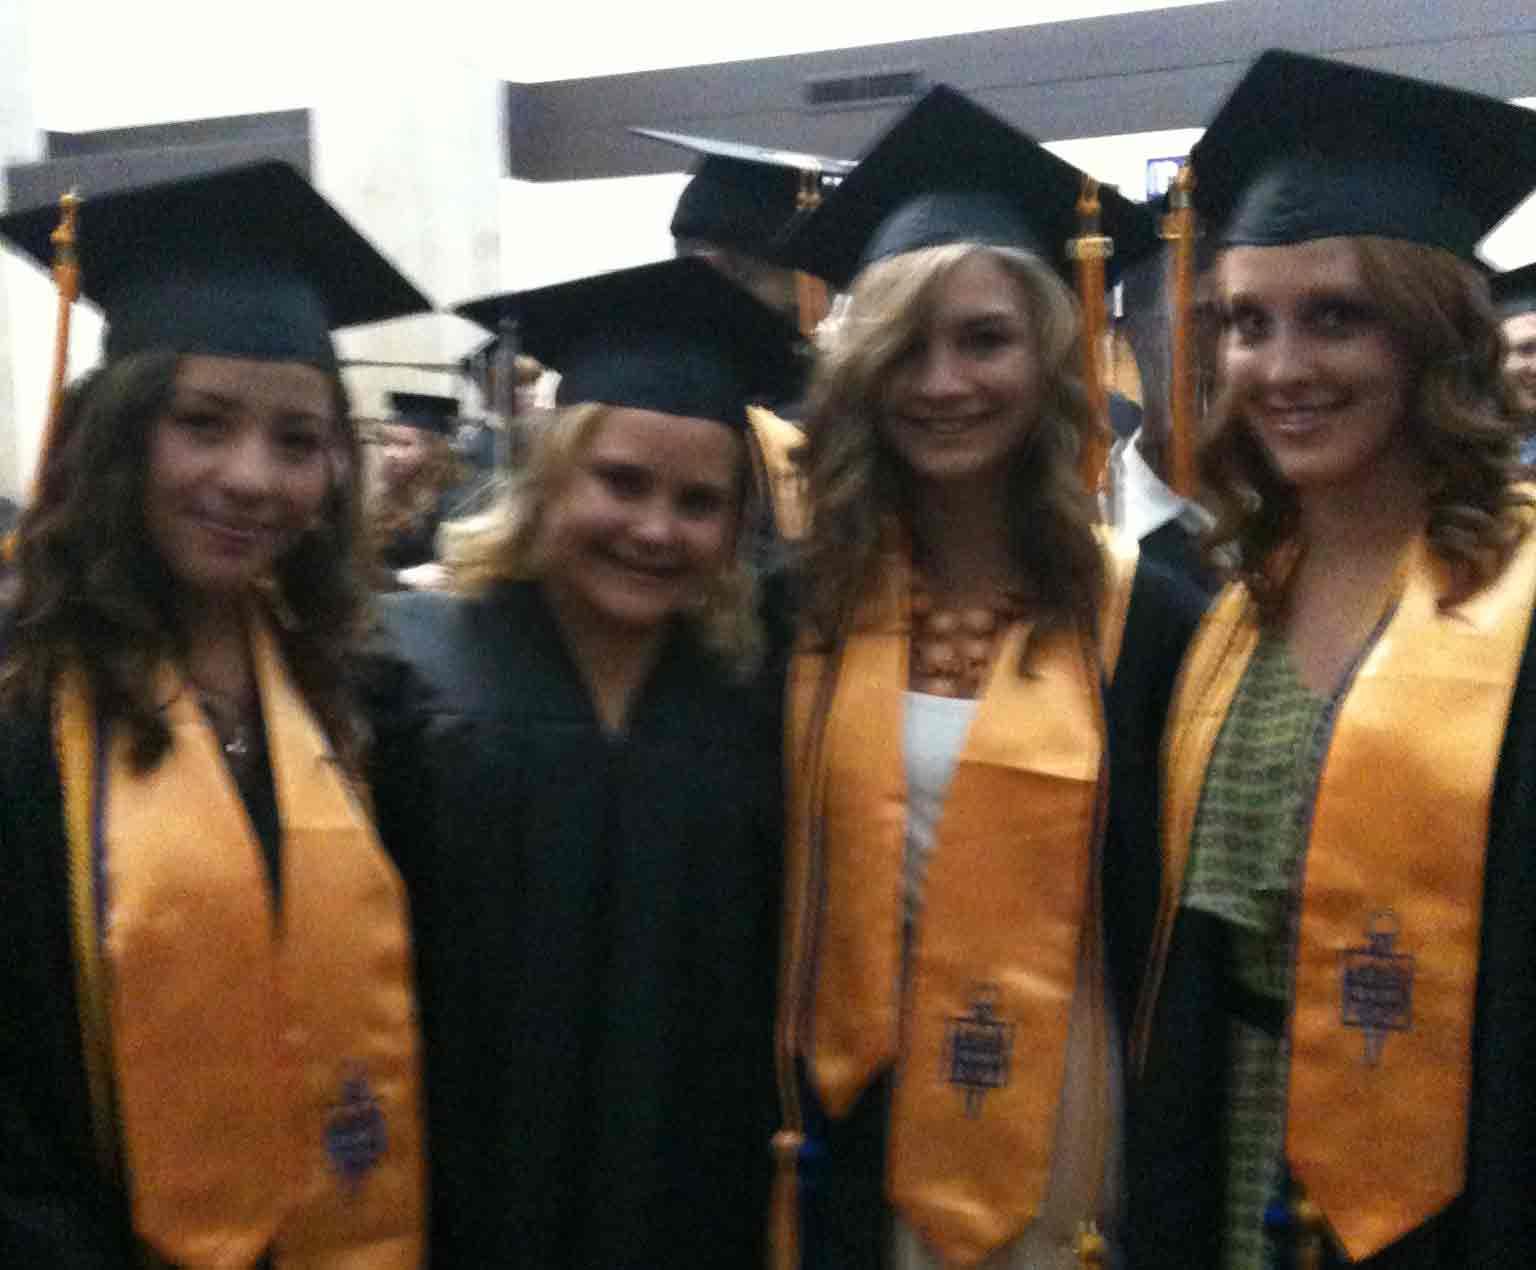 Ashley Gonzalez, Kailey Pakenham, Alex Konczak and Nora Burch prepare for graduation May 18.